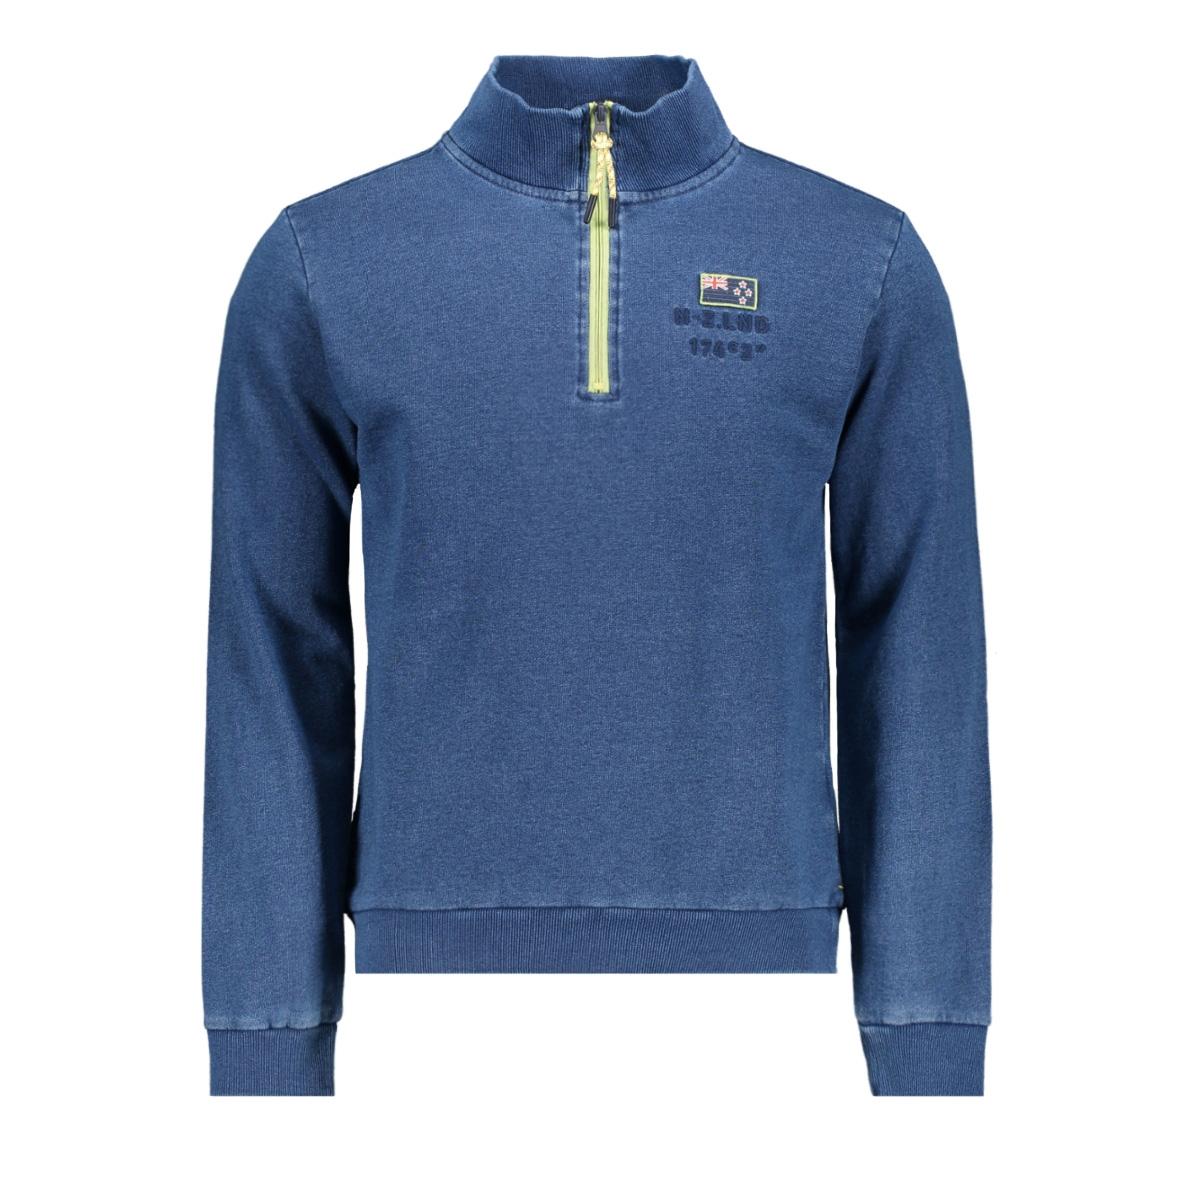 taharoa 20an307 nza sweater 396 indigo